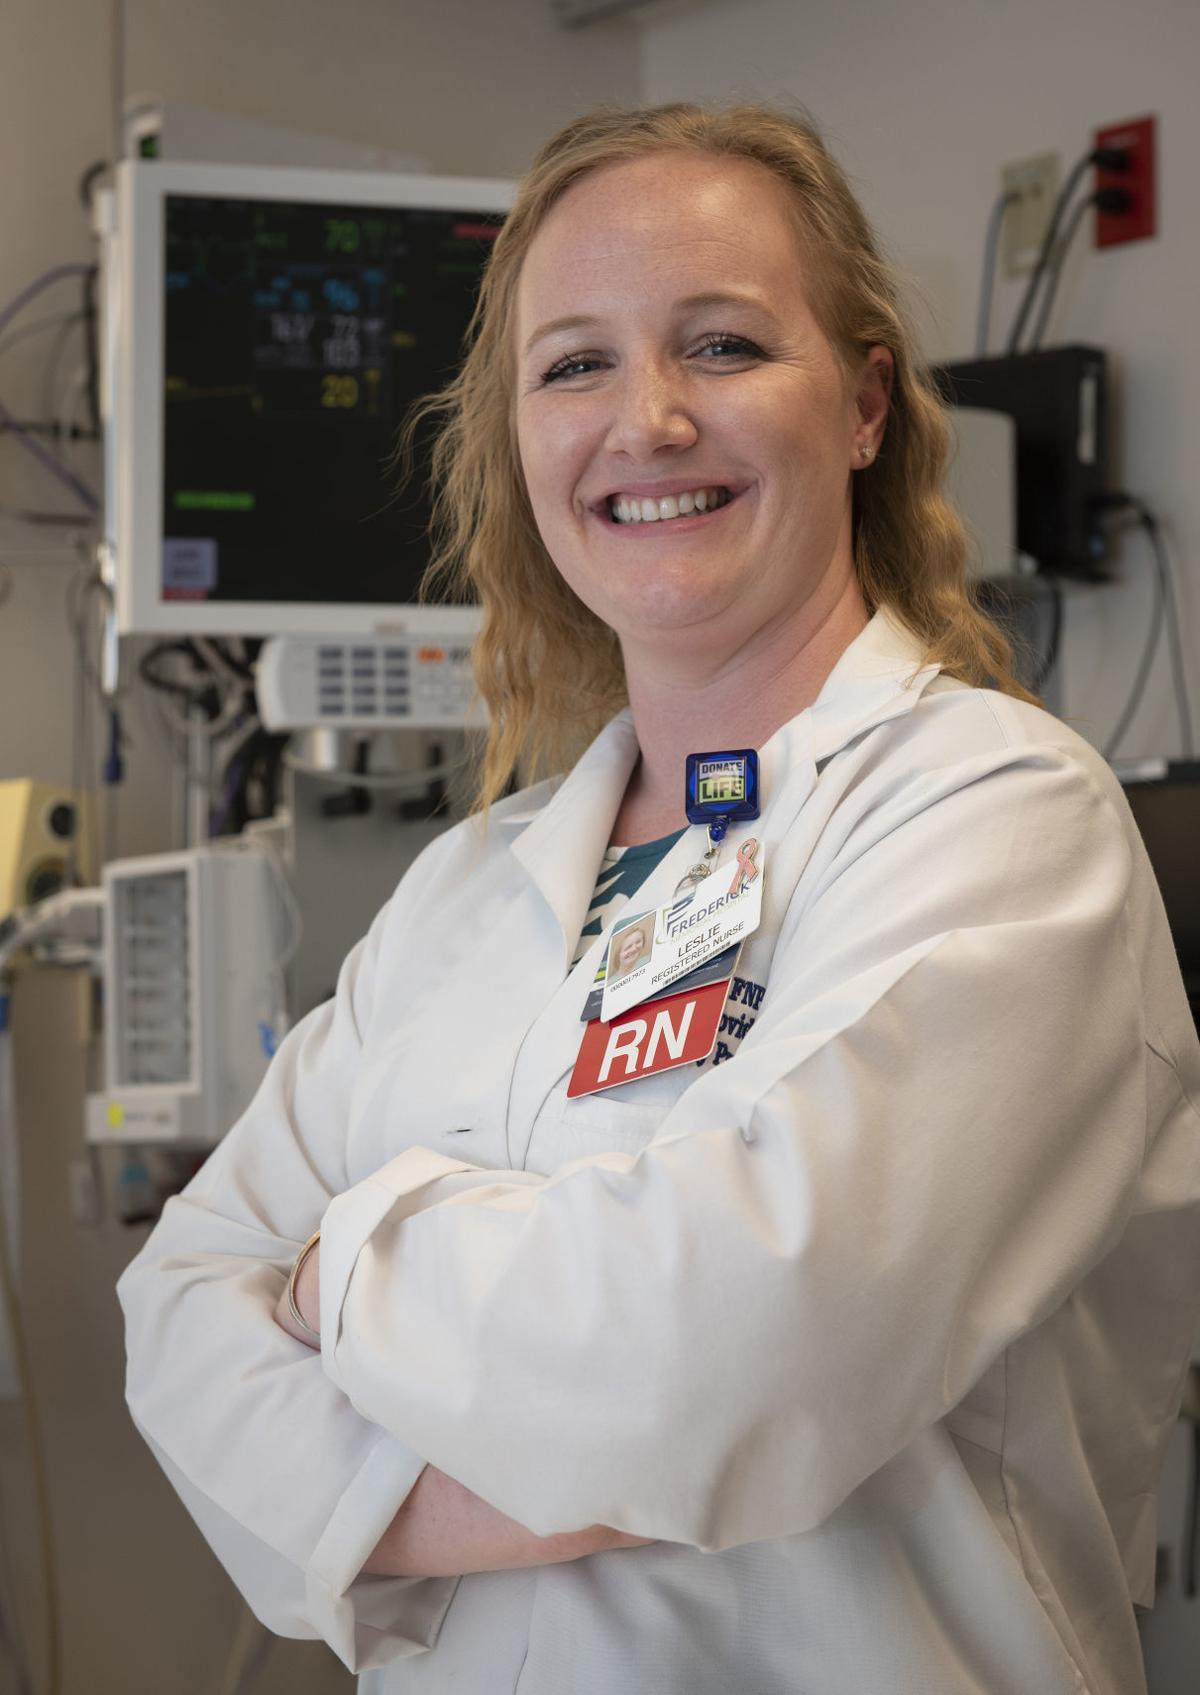 Nurse Year